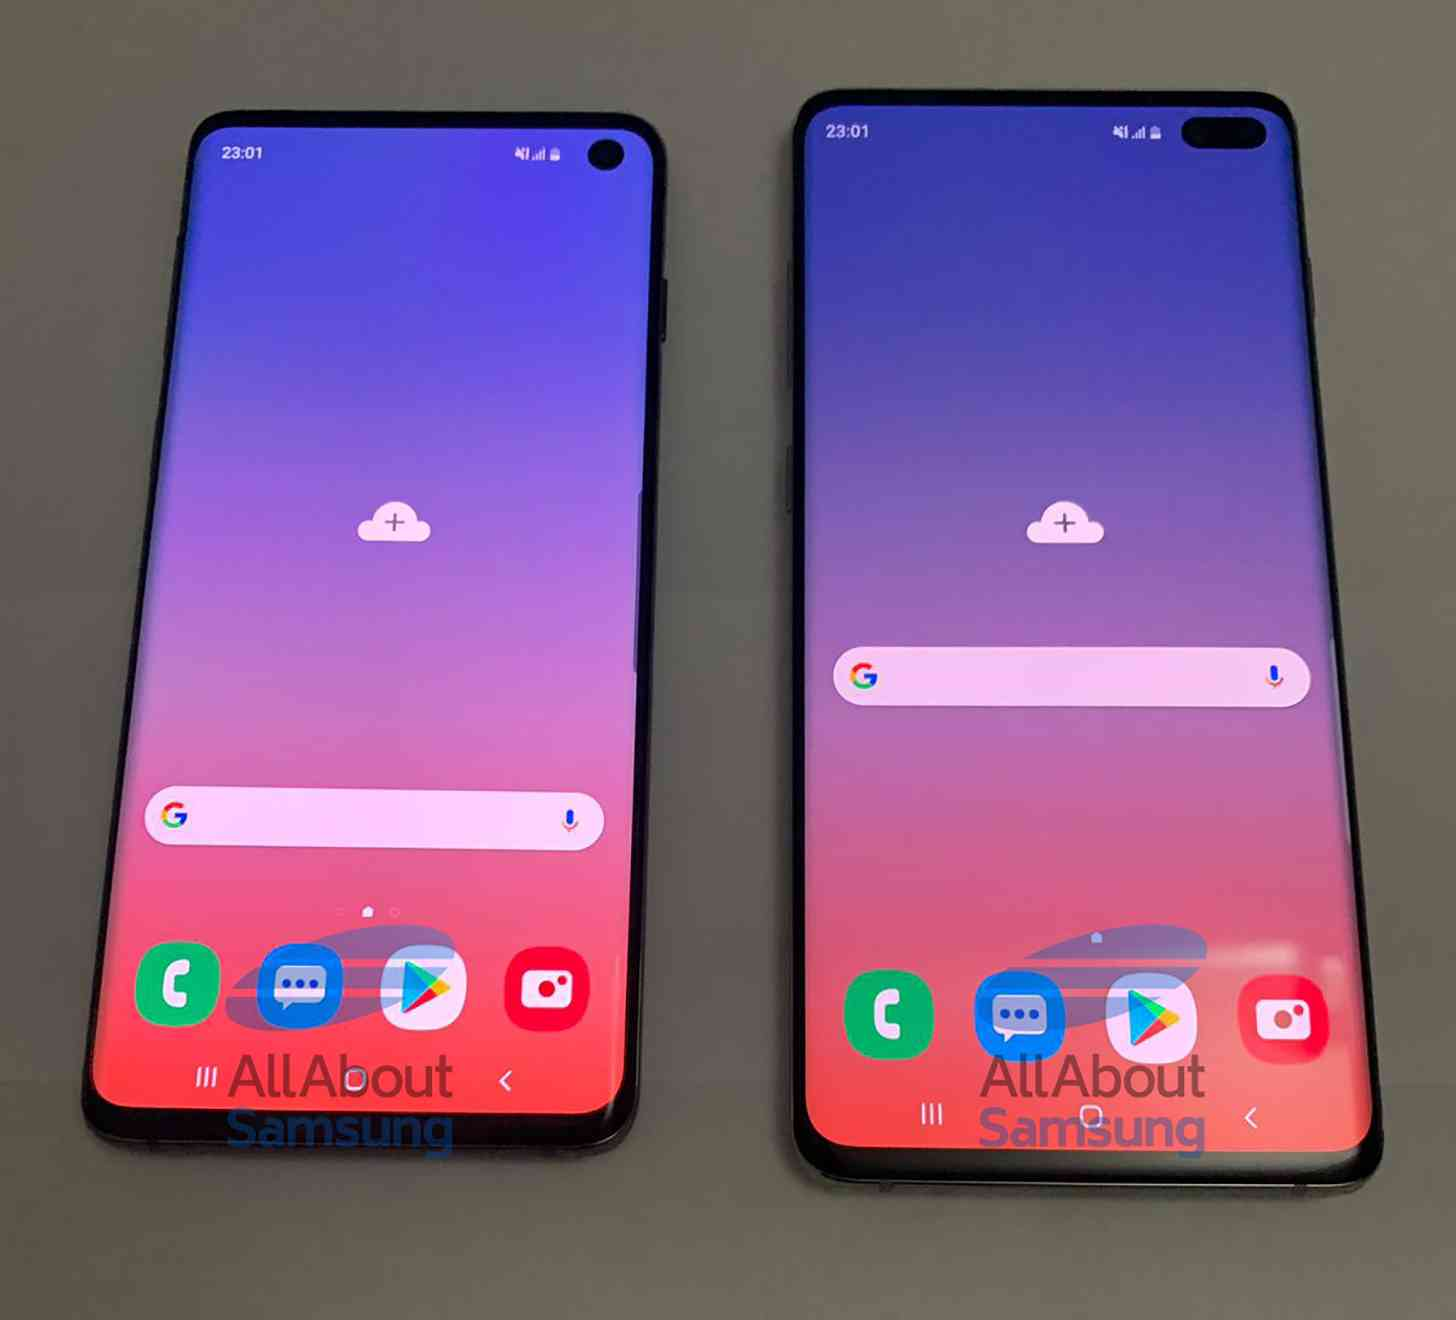 Samsung Galaxy S10, S10+ leak